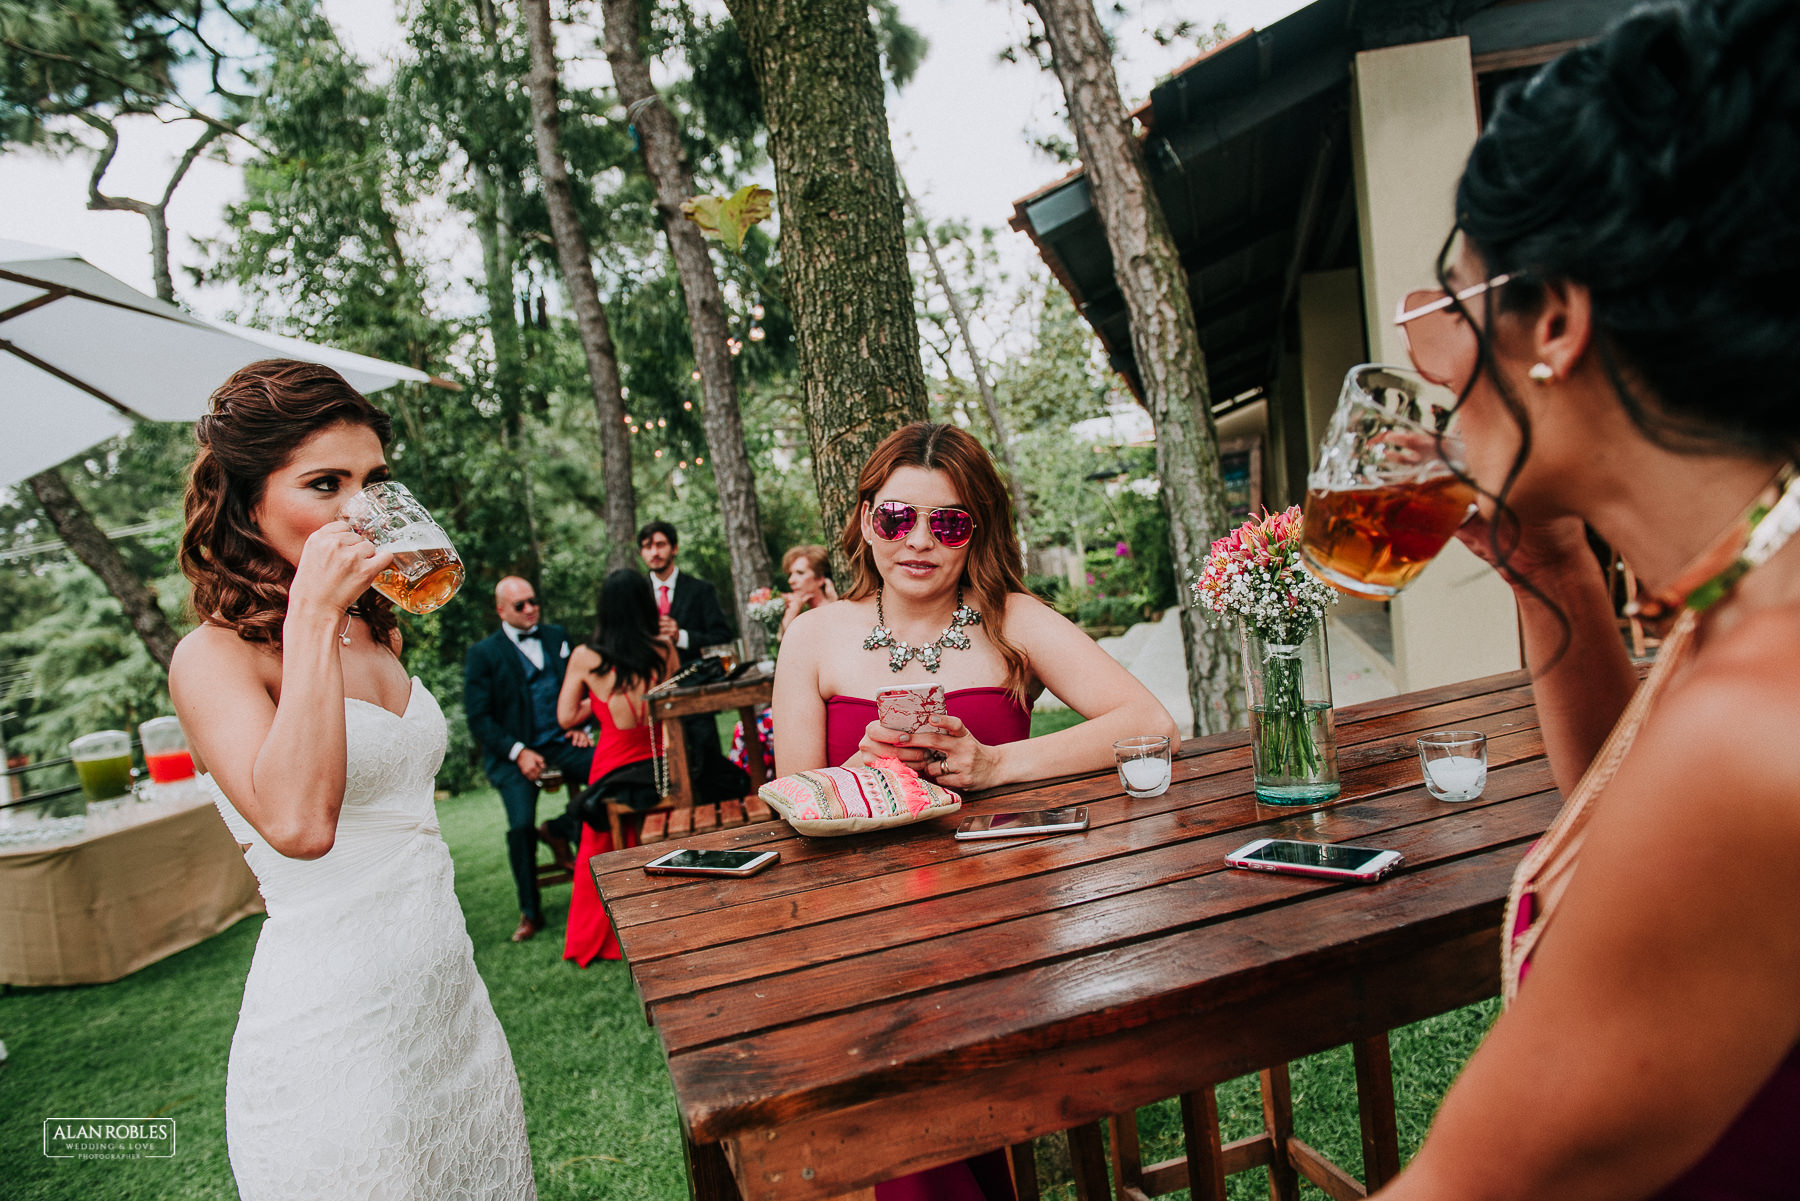 Fotografo de bodas guadalajara Alan Robles - Pinare terraza bistro 8